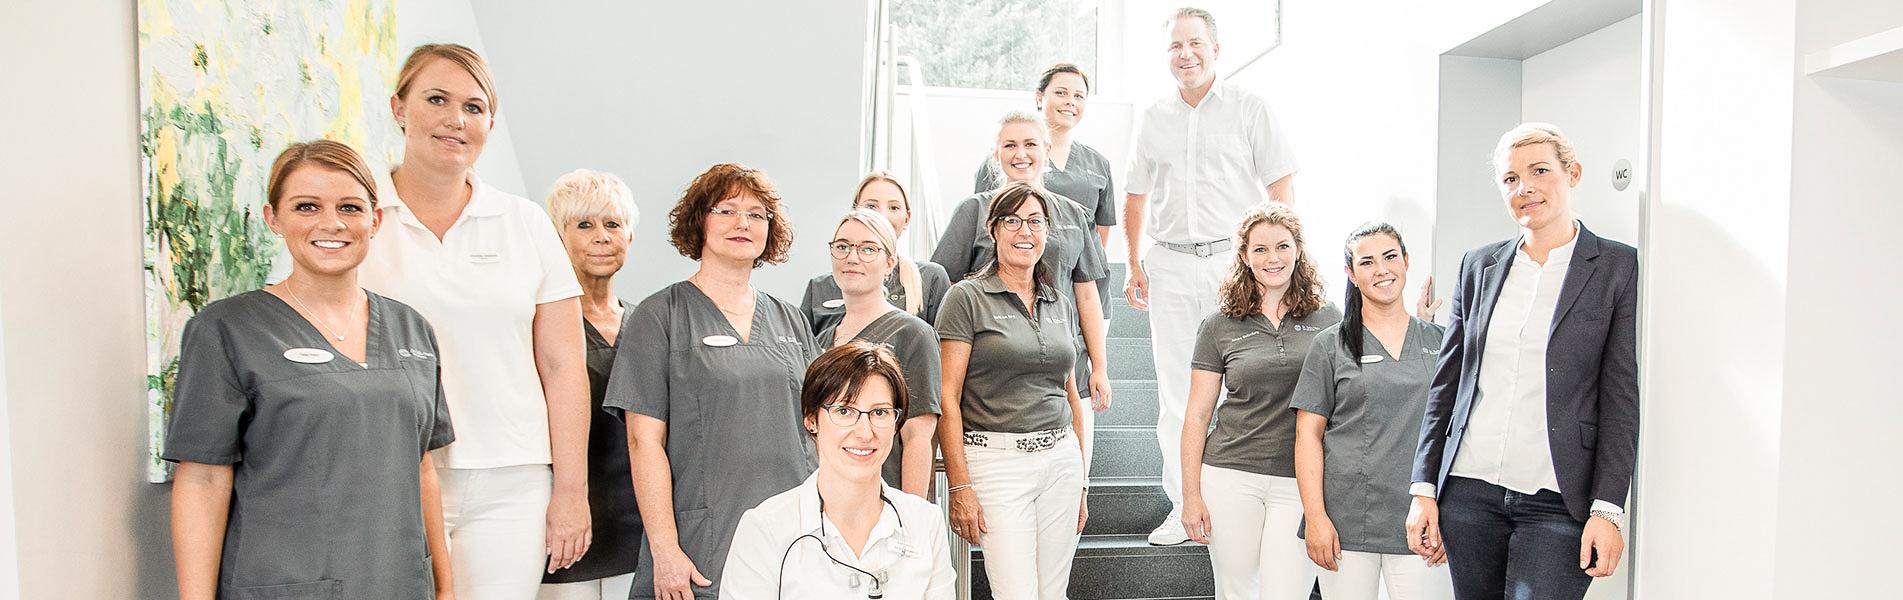 Philosophie- Zahnarztpraxis Dr. Tolk + Team in Kreuzau bei Düren